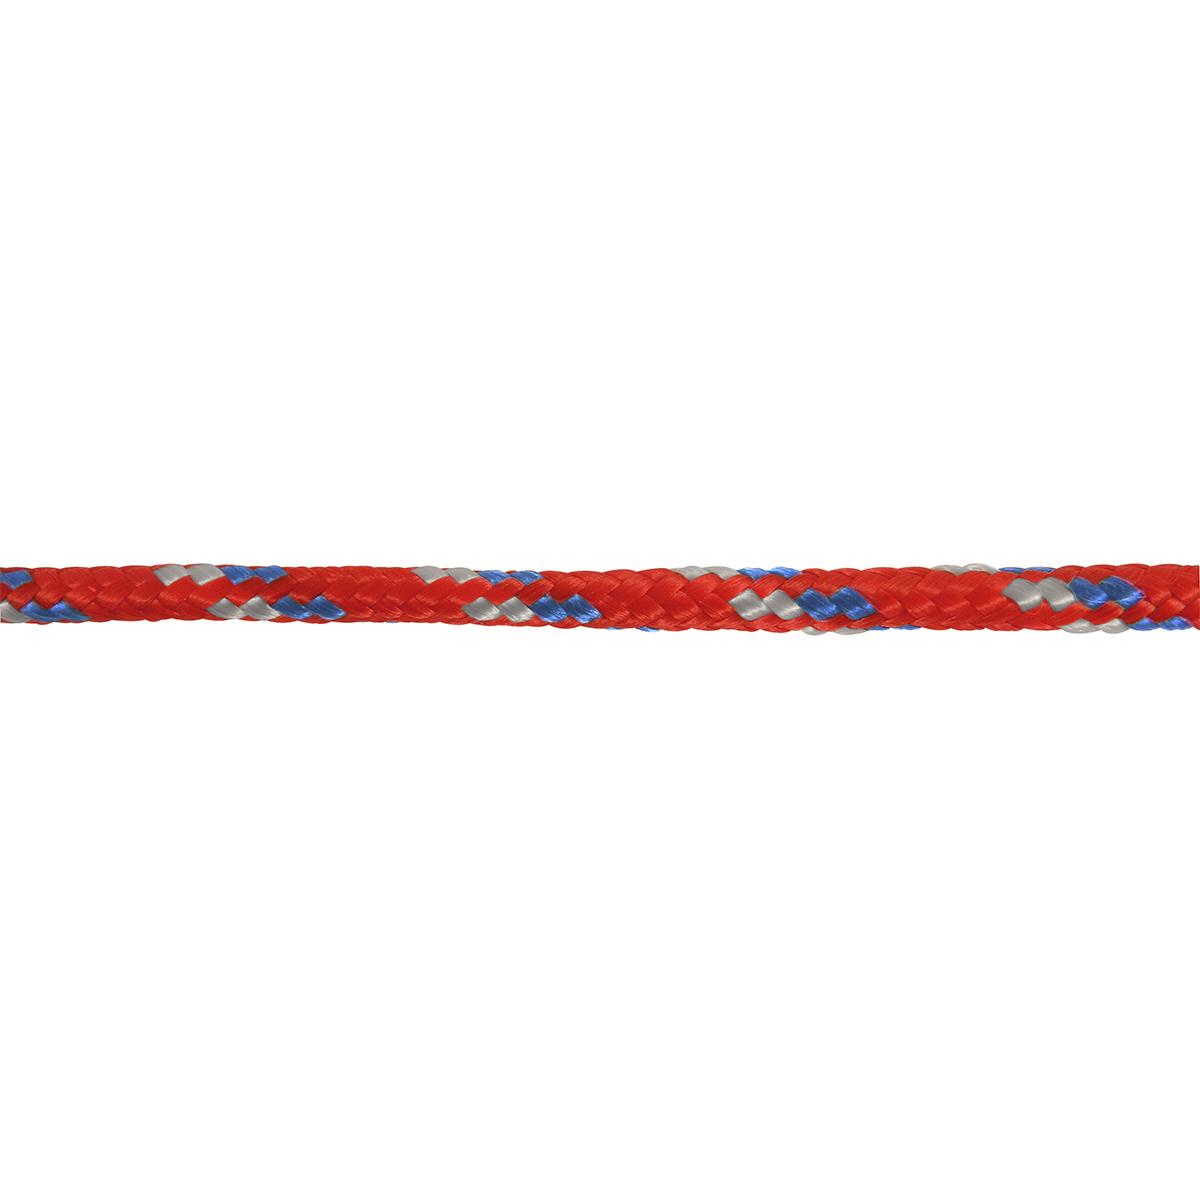 Polypropylene Diamond Braid Rope - Varied - 3/8-in x 50-ft